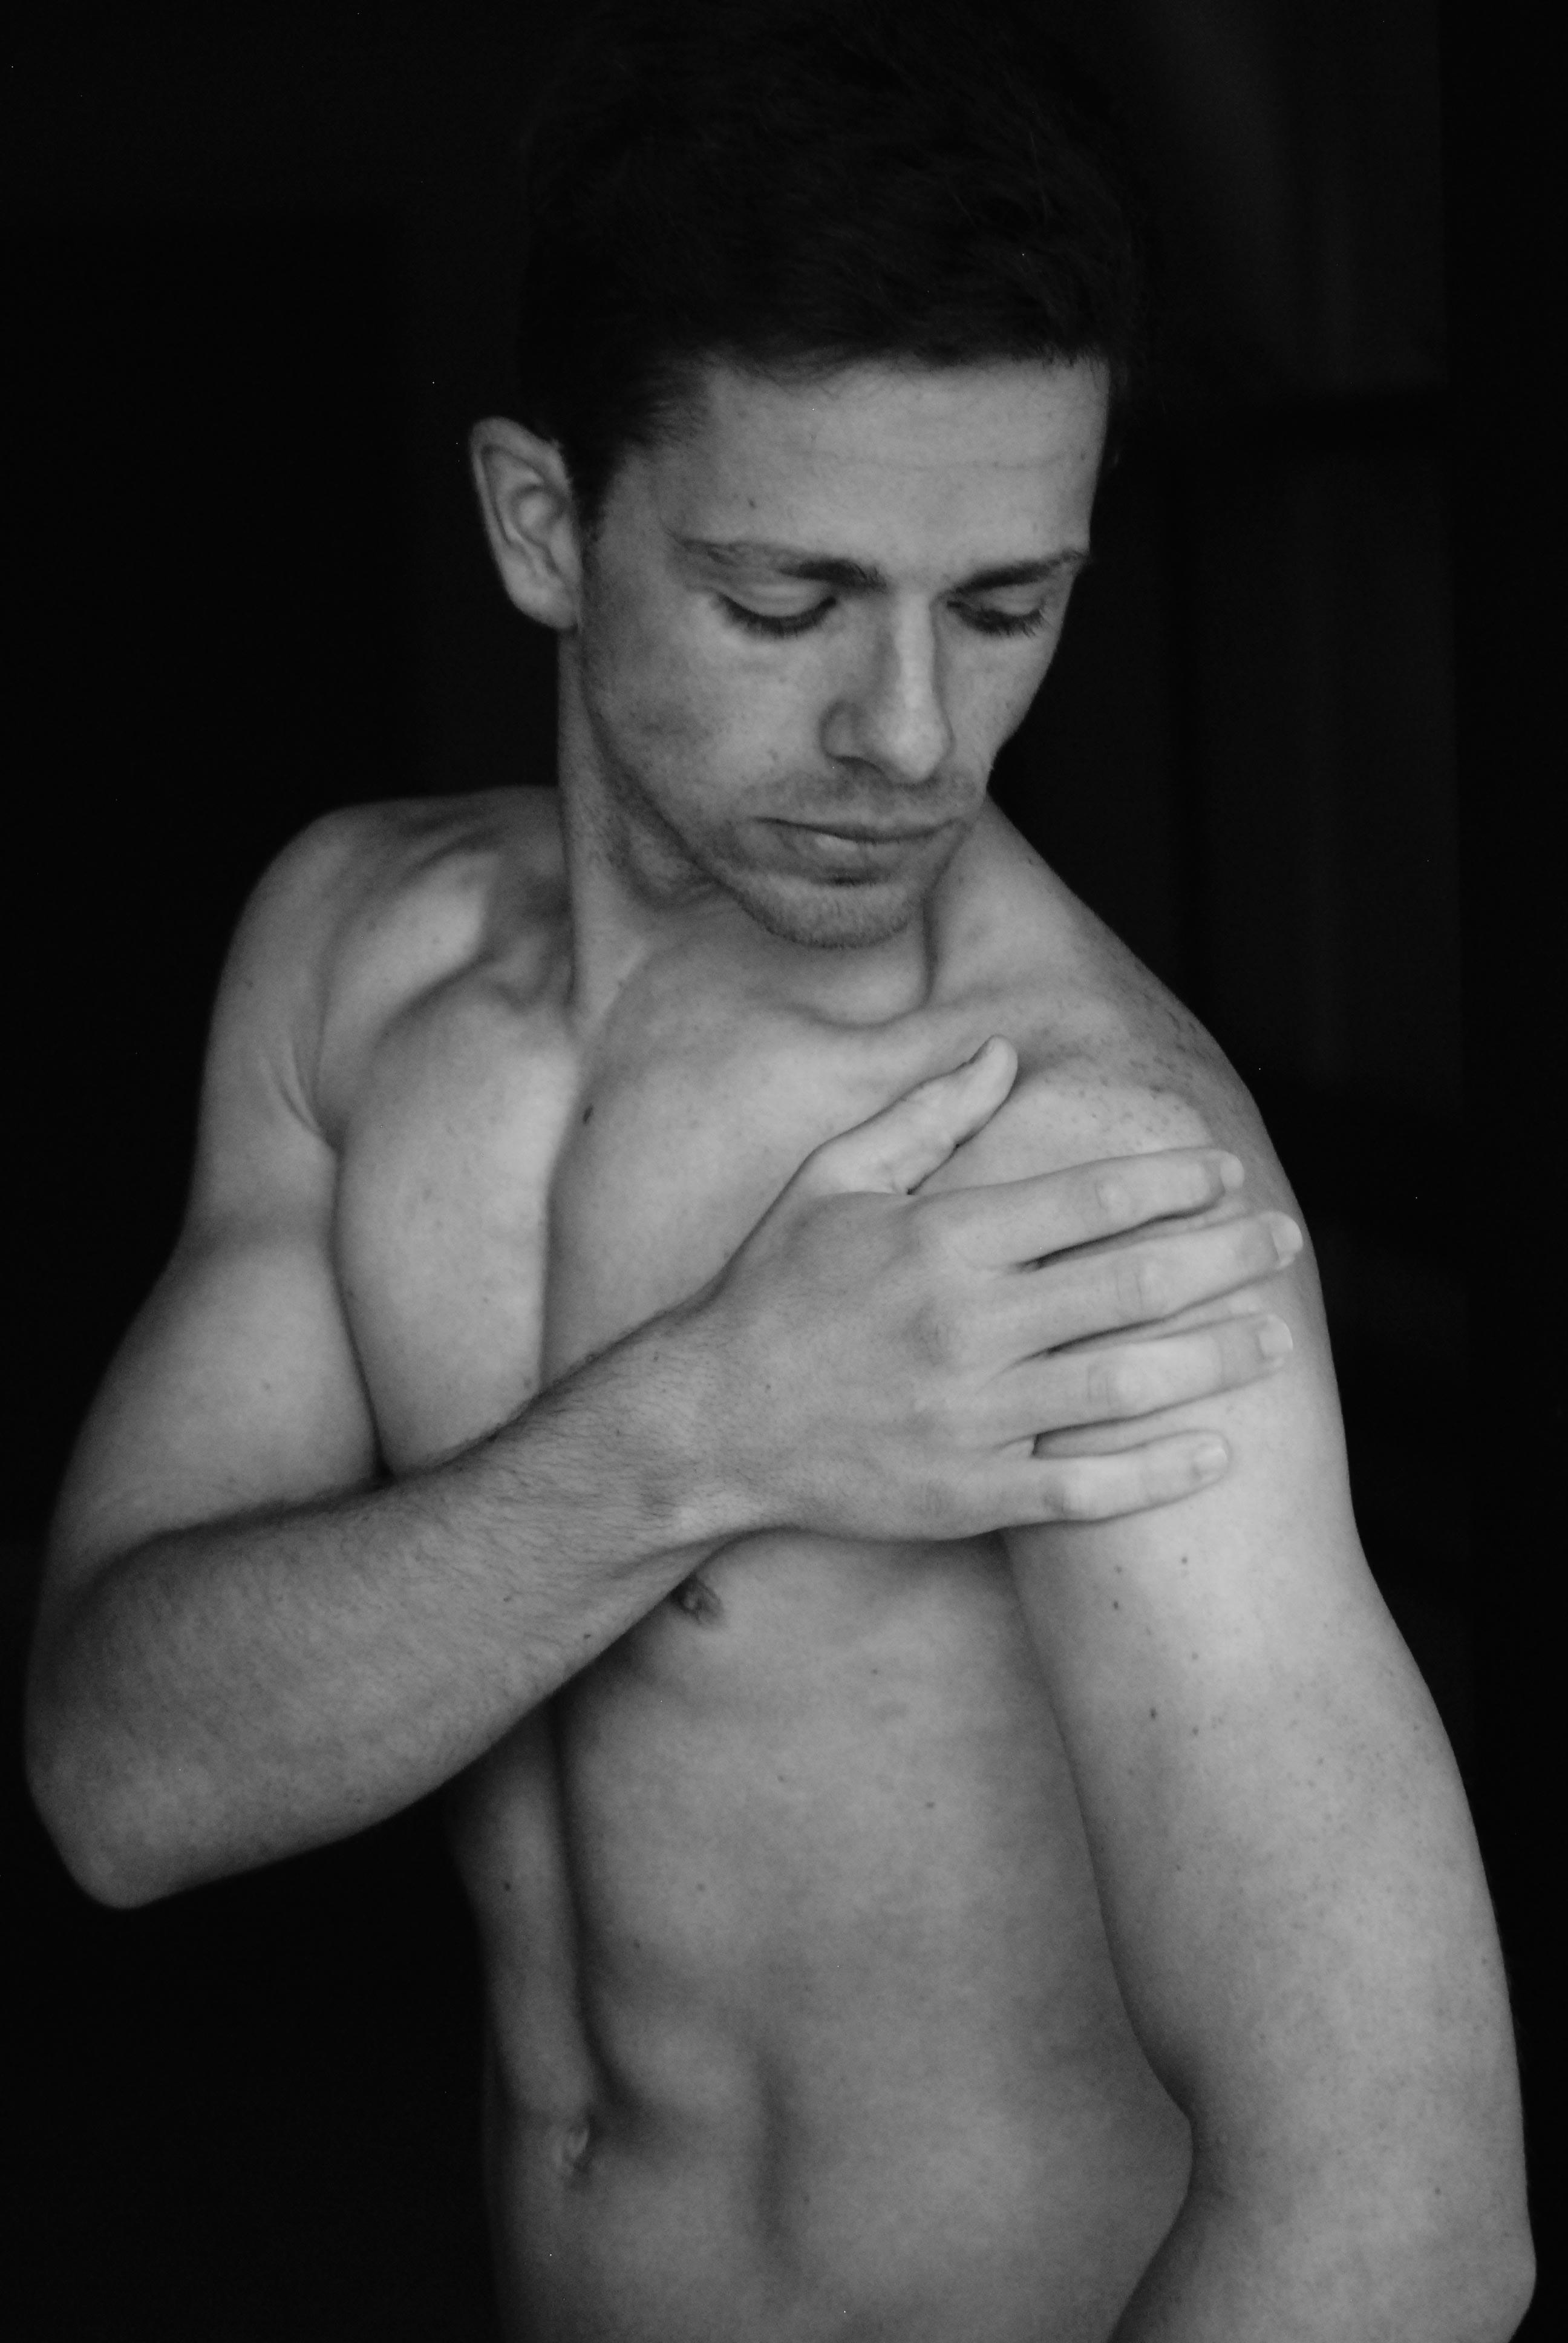 Man Shooting Rybakov Photography Fotografie